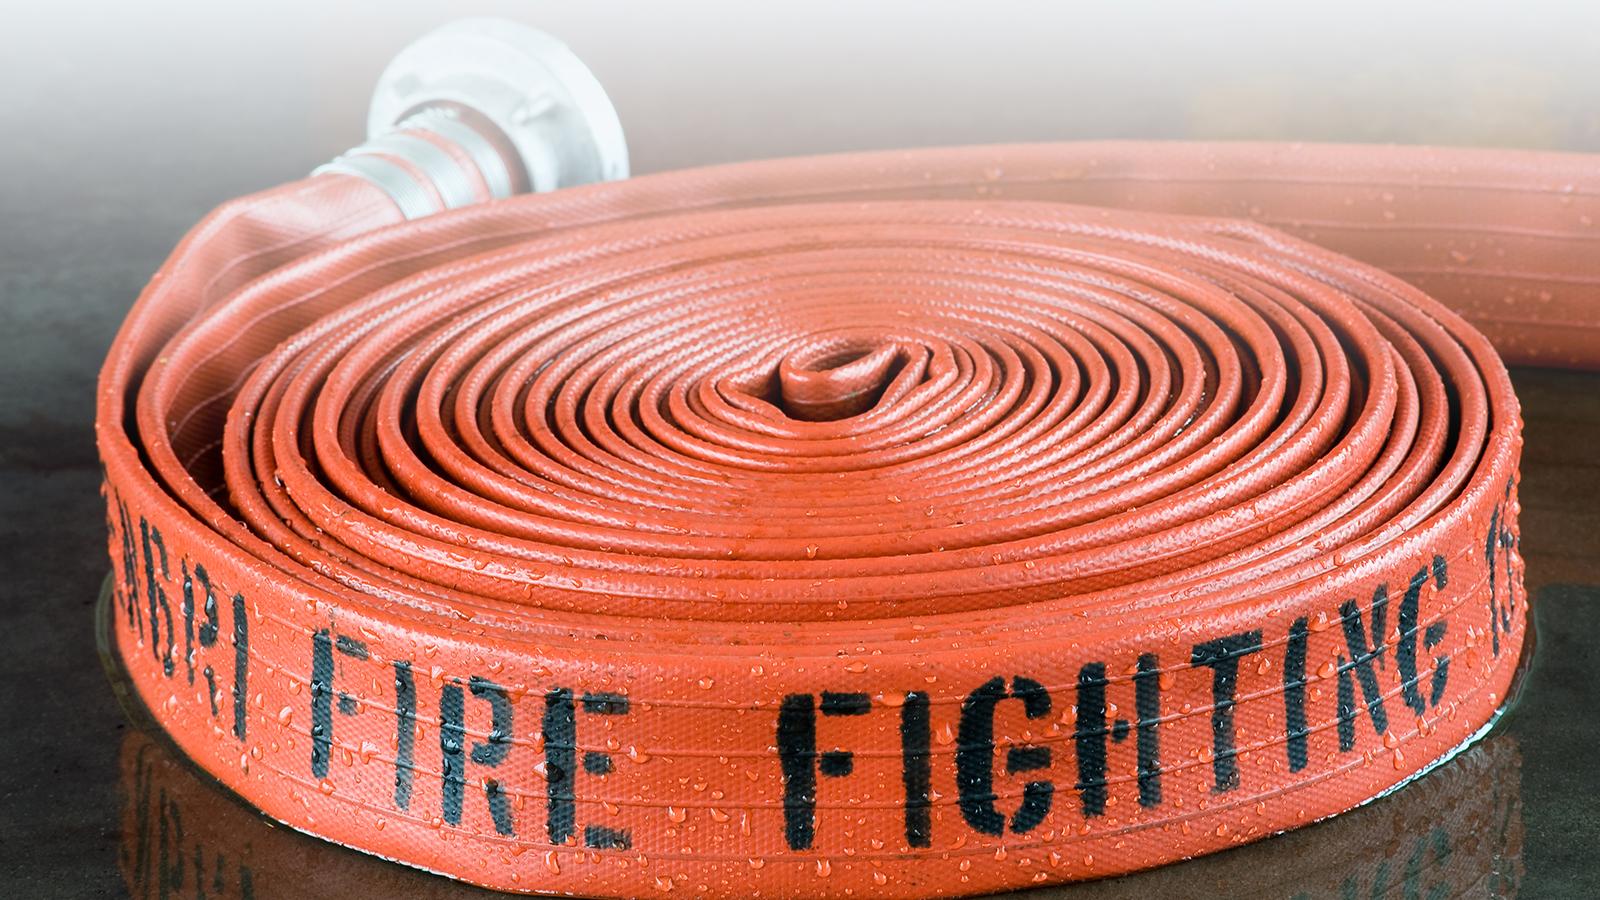 Icona tubi preisolati antincendio